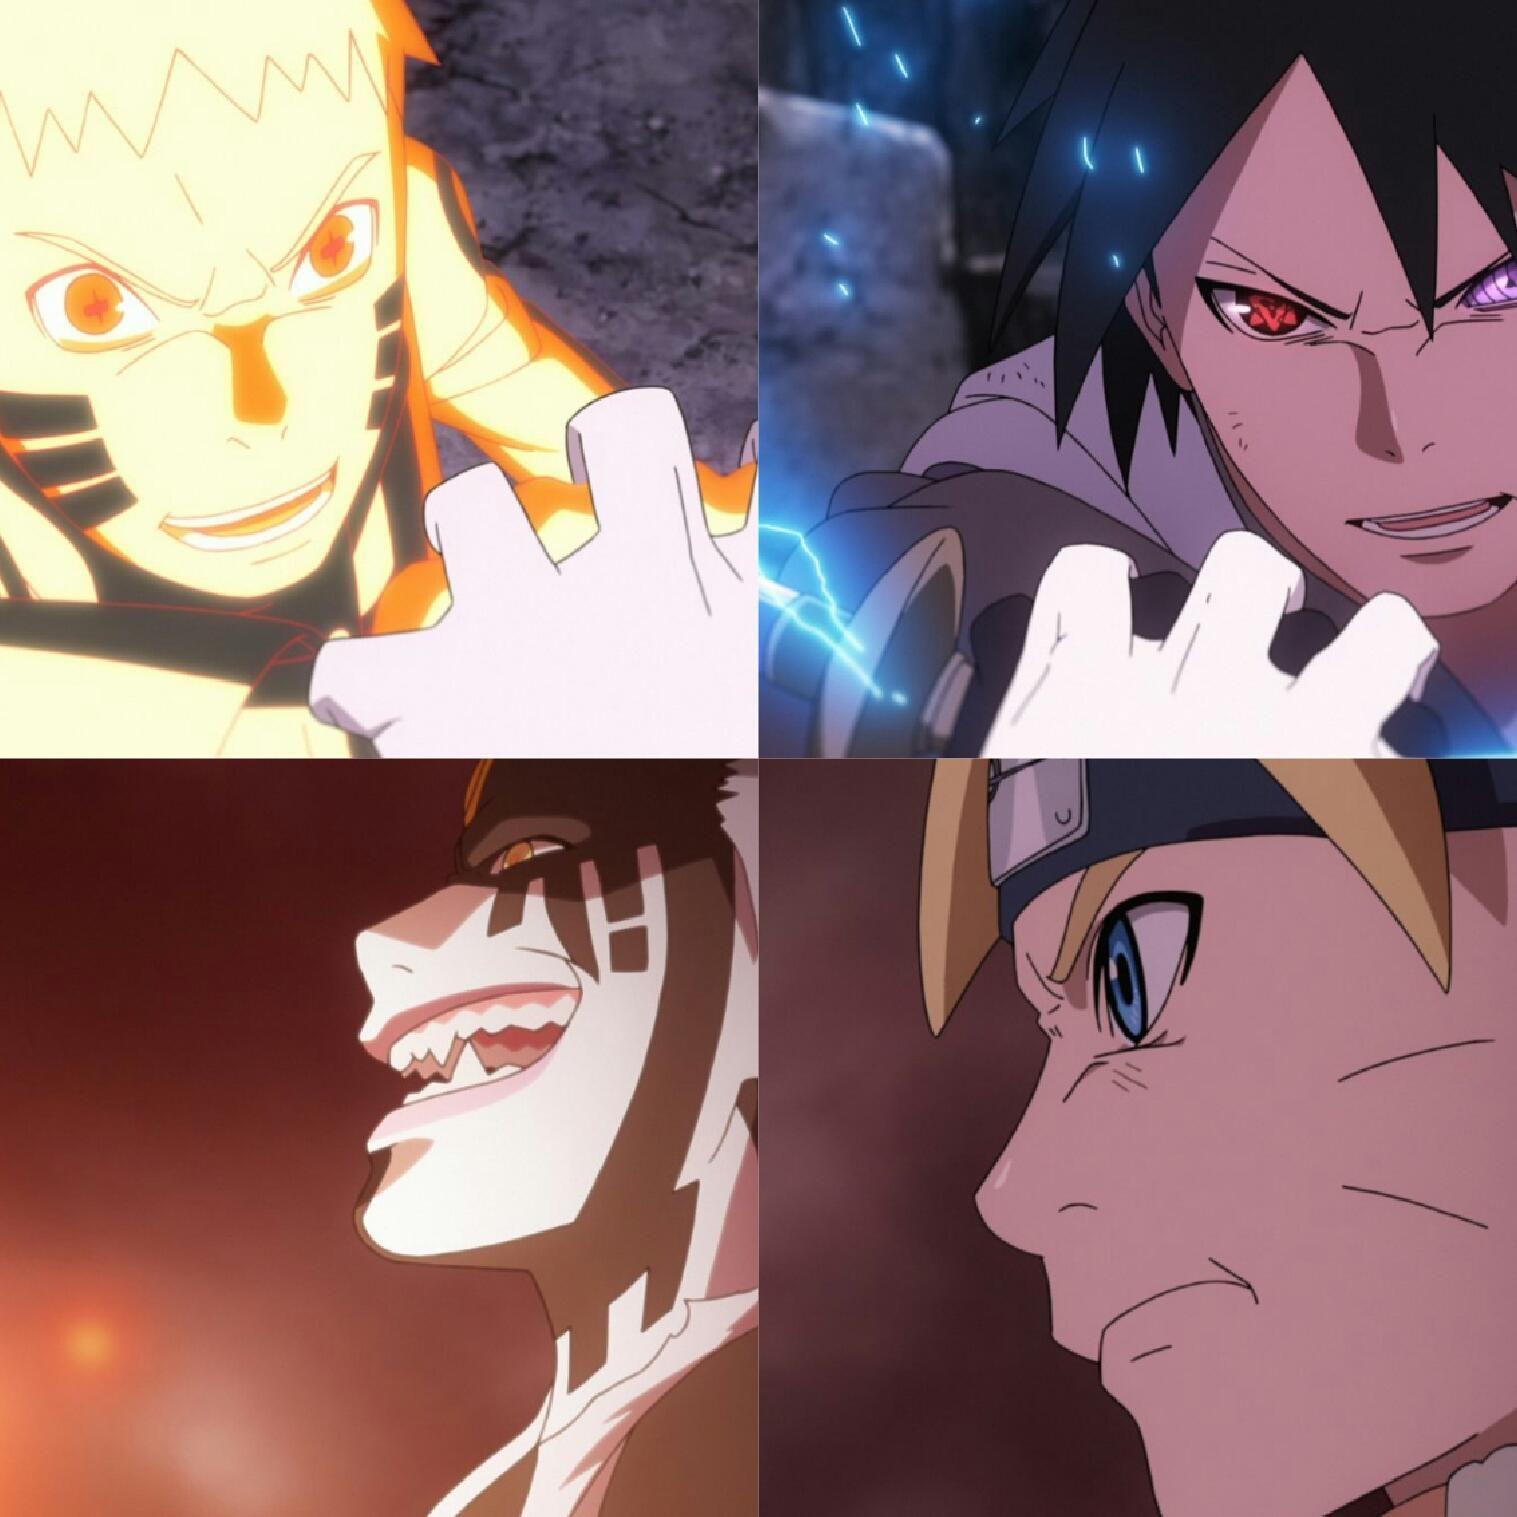 Boruto episode 65 spoiler images | Naruto | Boruto episodes